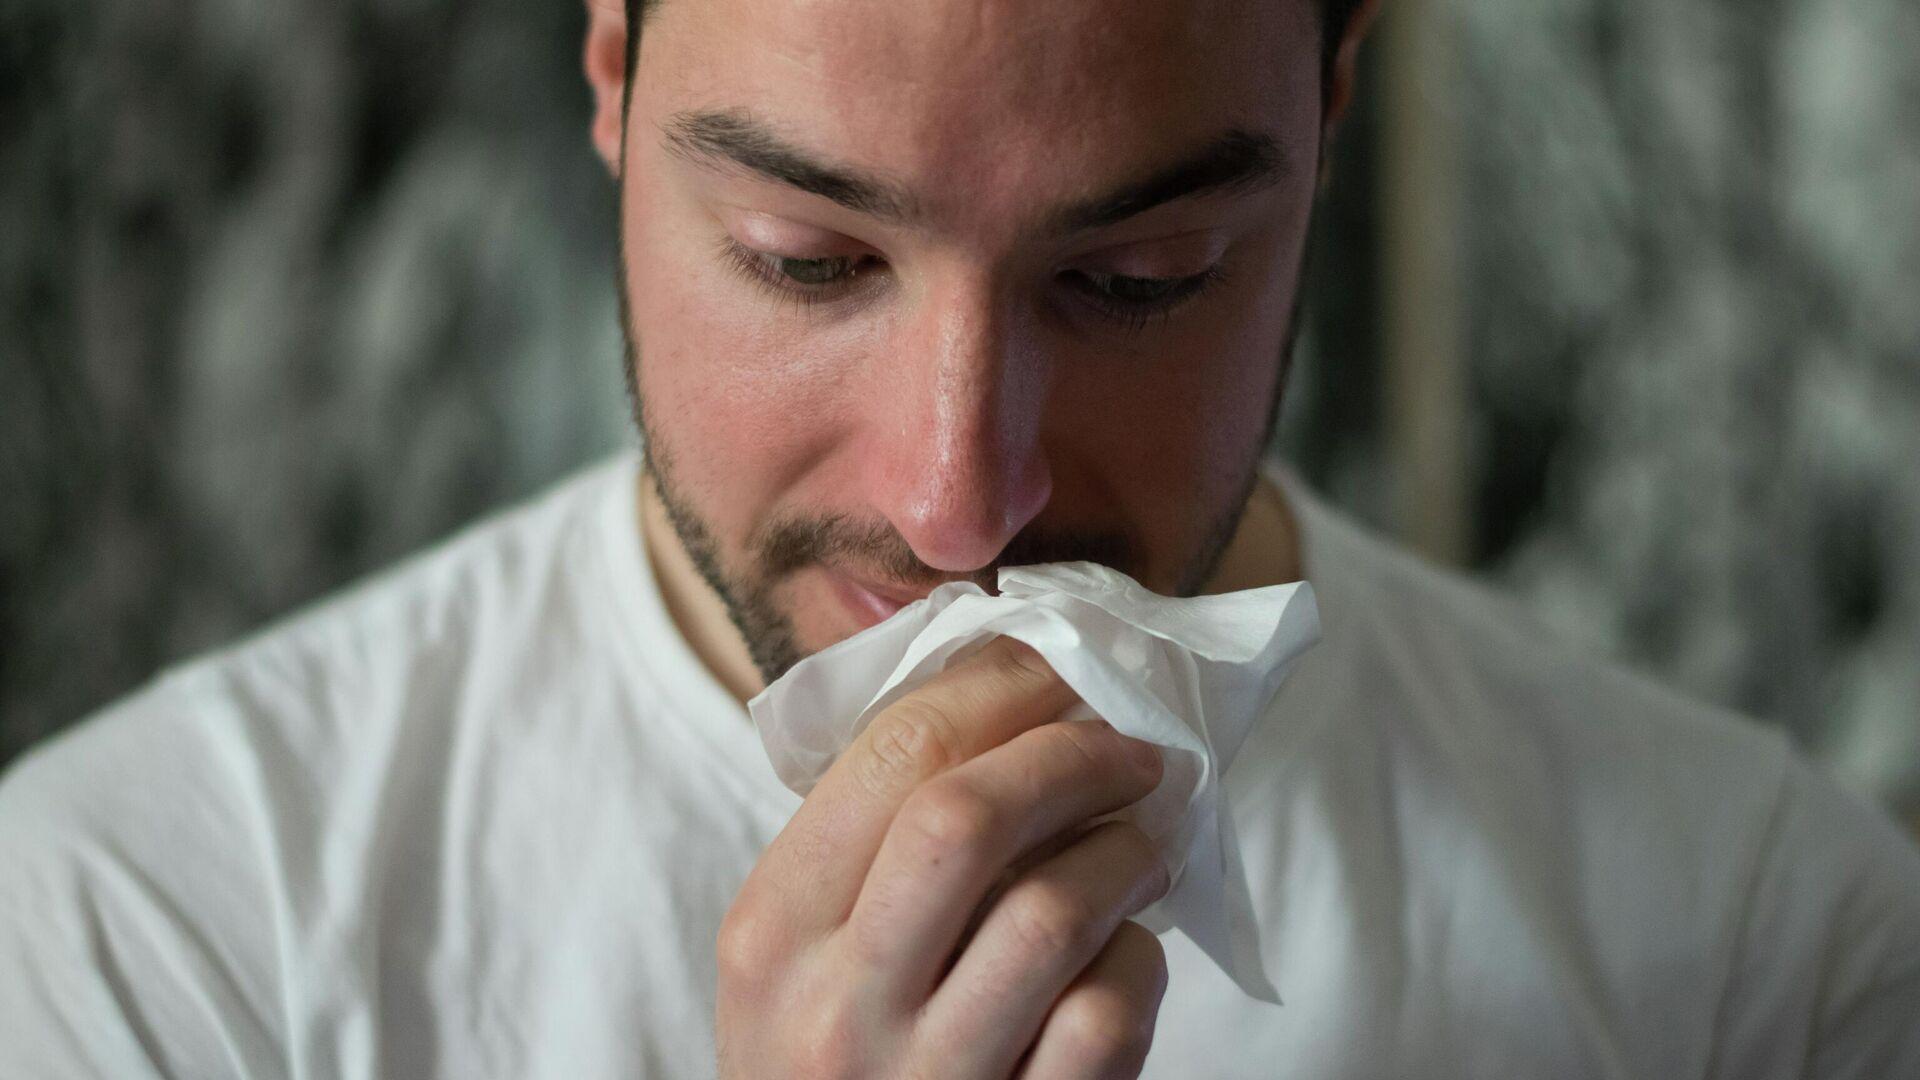 Un hombre se limpia la nariz con un pañuelo de papel - Sputnik Mundo, 1920, 04.05.2021